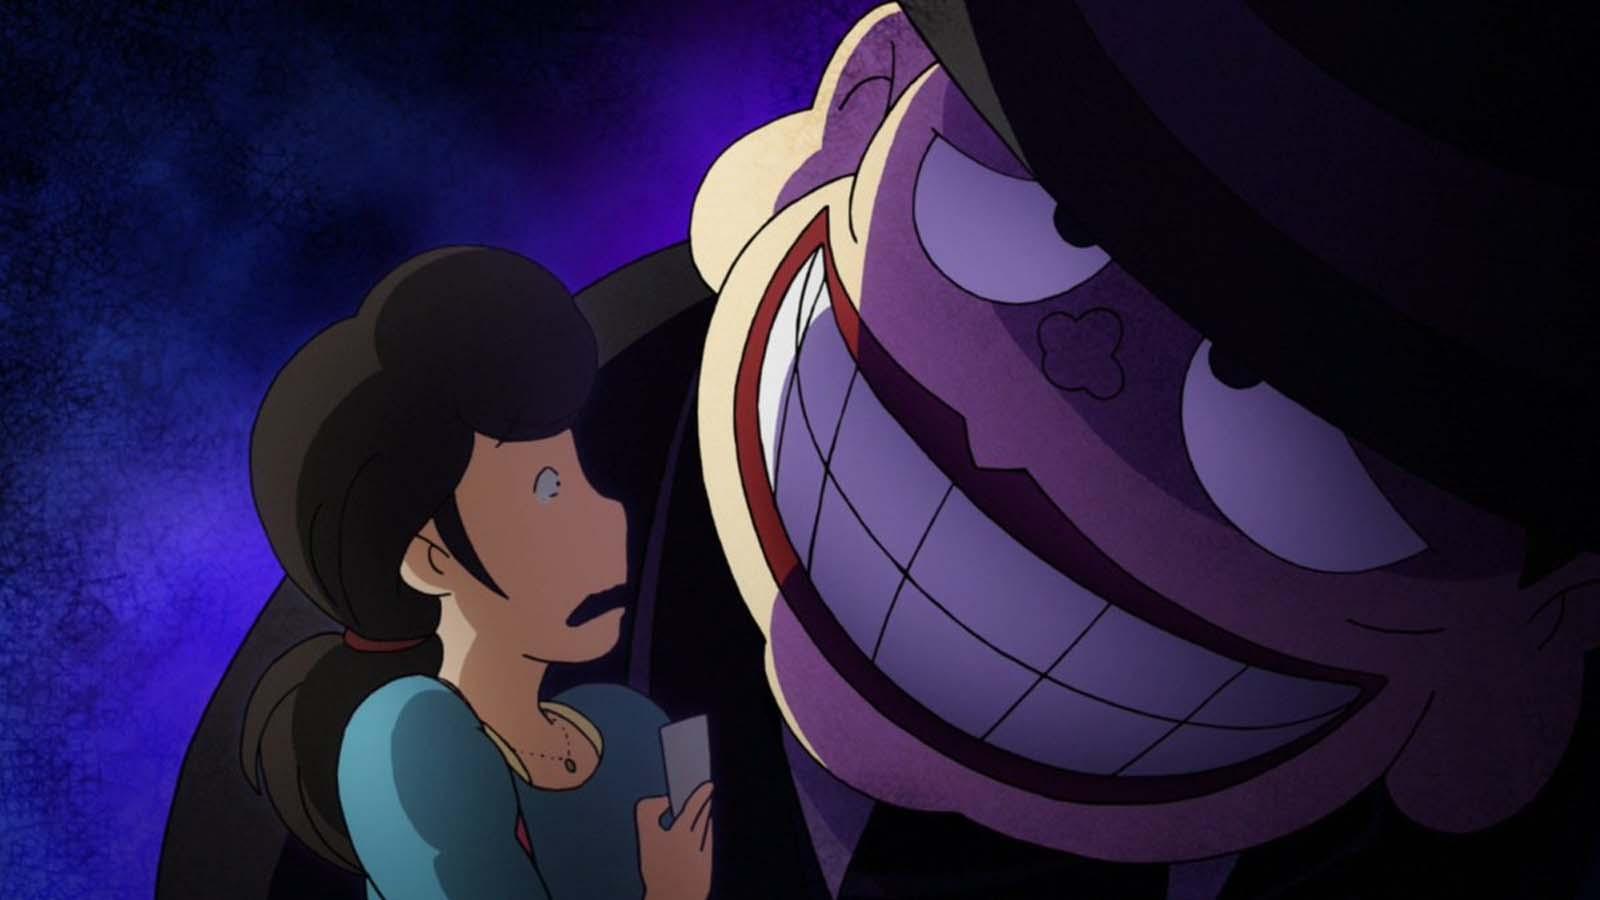 Mejores personajes timadores del anime